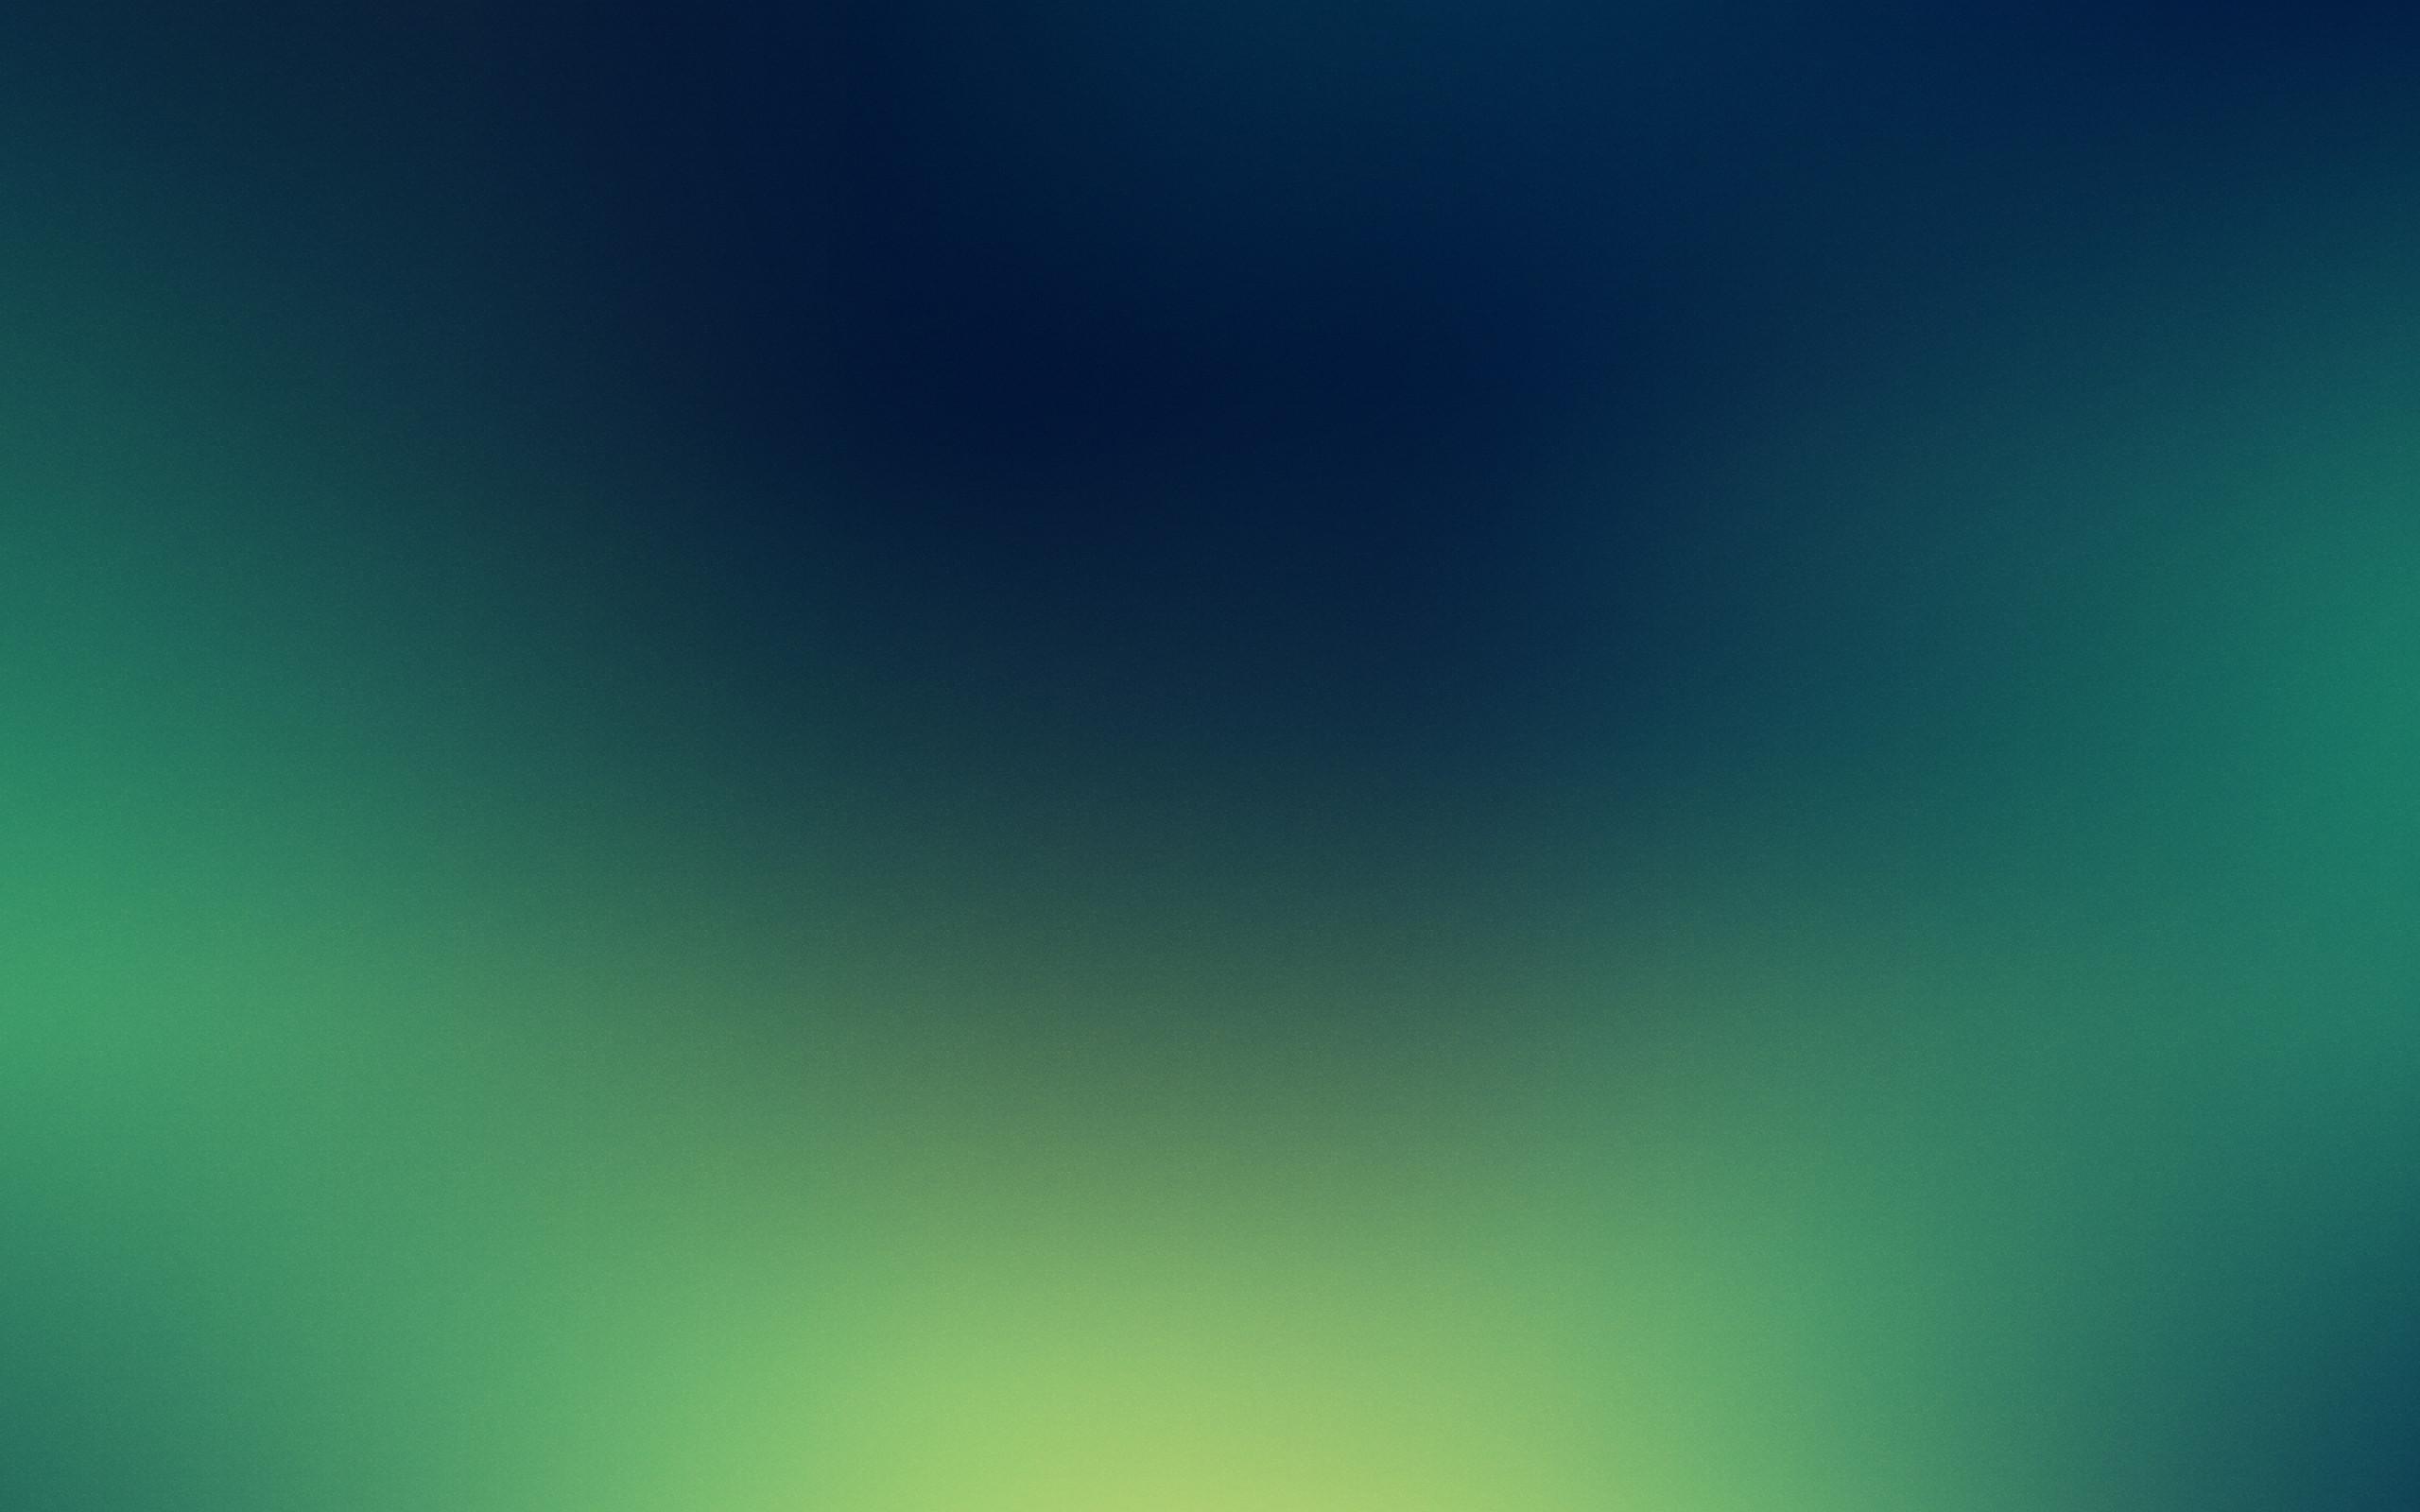 HD Apple wallpaper Desktop Wallpapers System wallpaper 1920×1200 Hd Apple  Wallpapers (32 Wallpapers) | Adorable Wallpapers | Desktop wallpapers |  Pinterest …